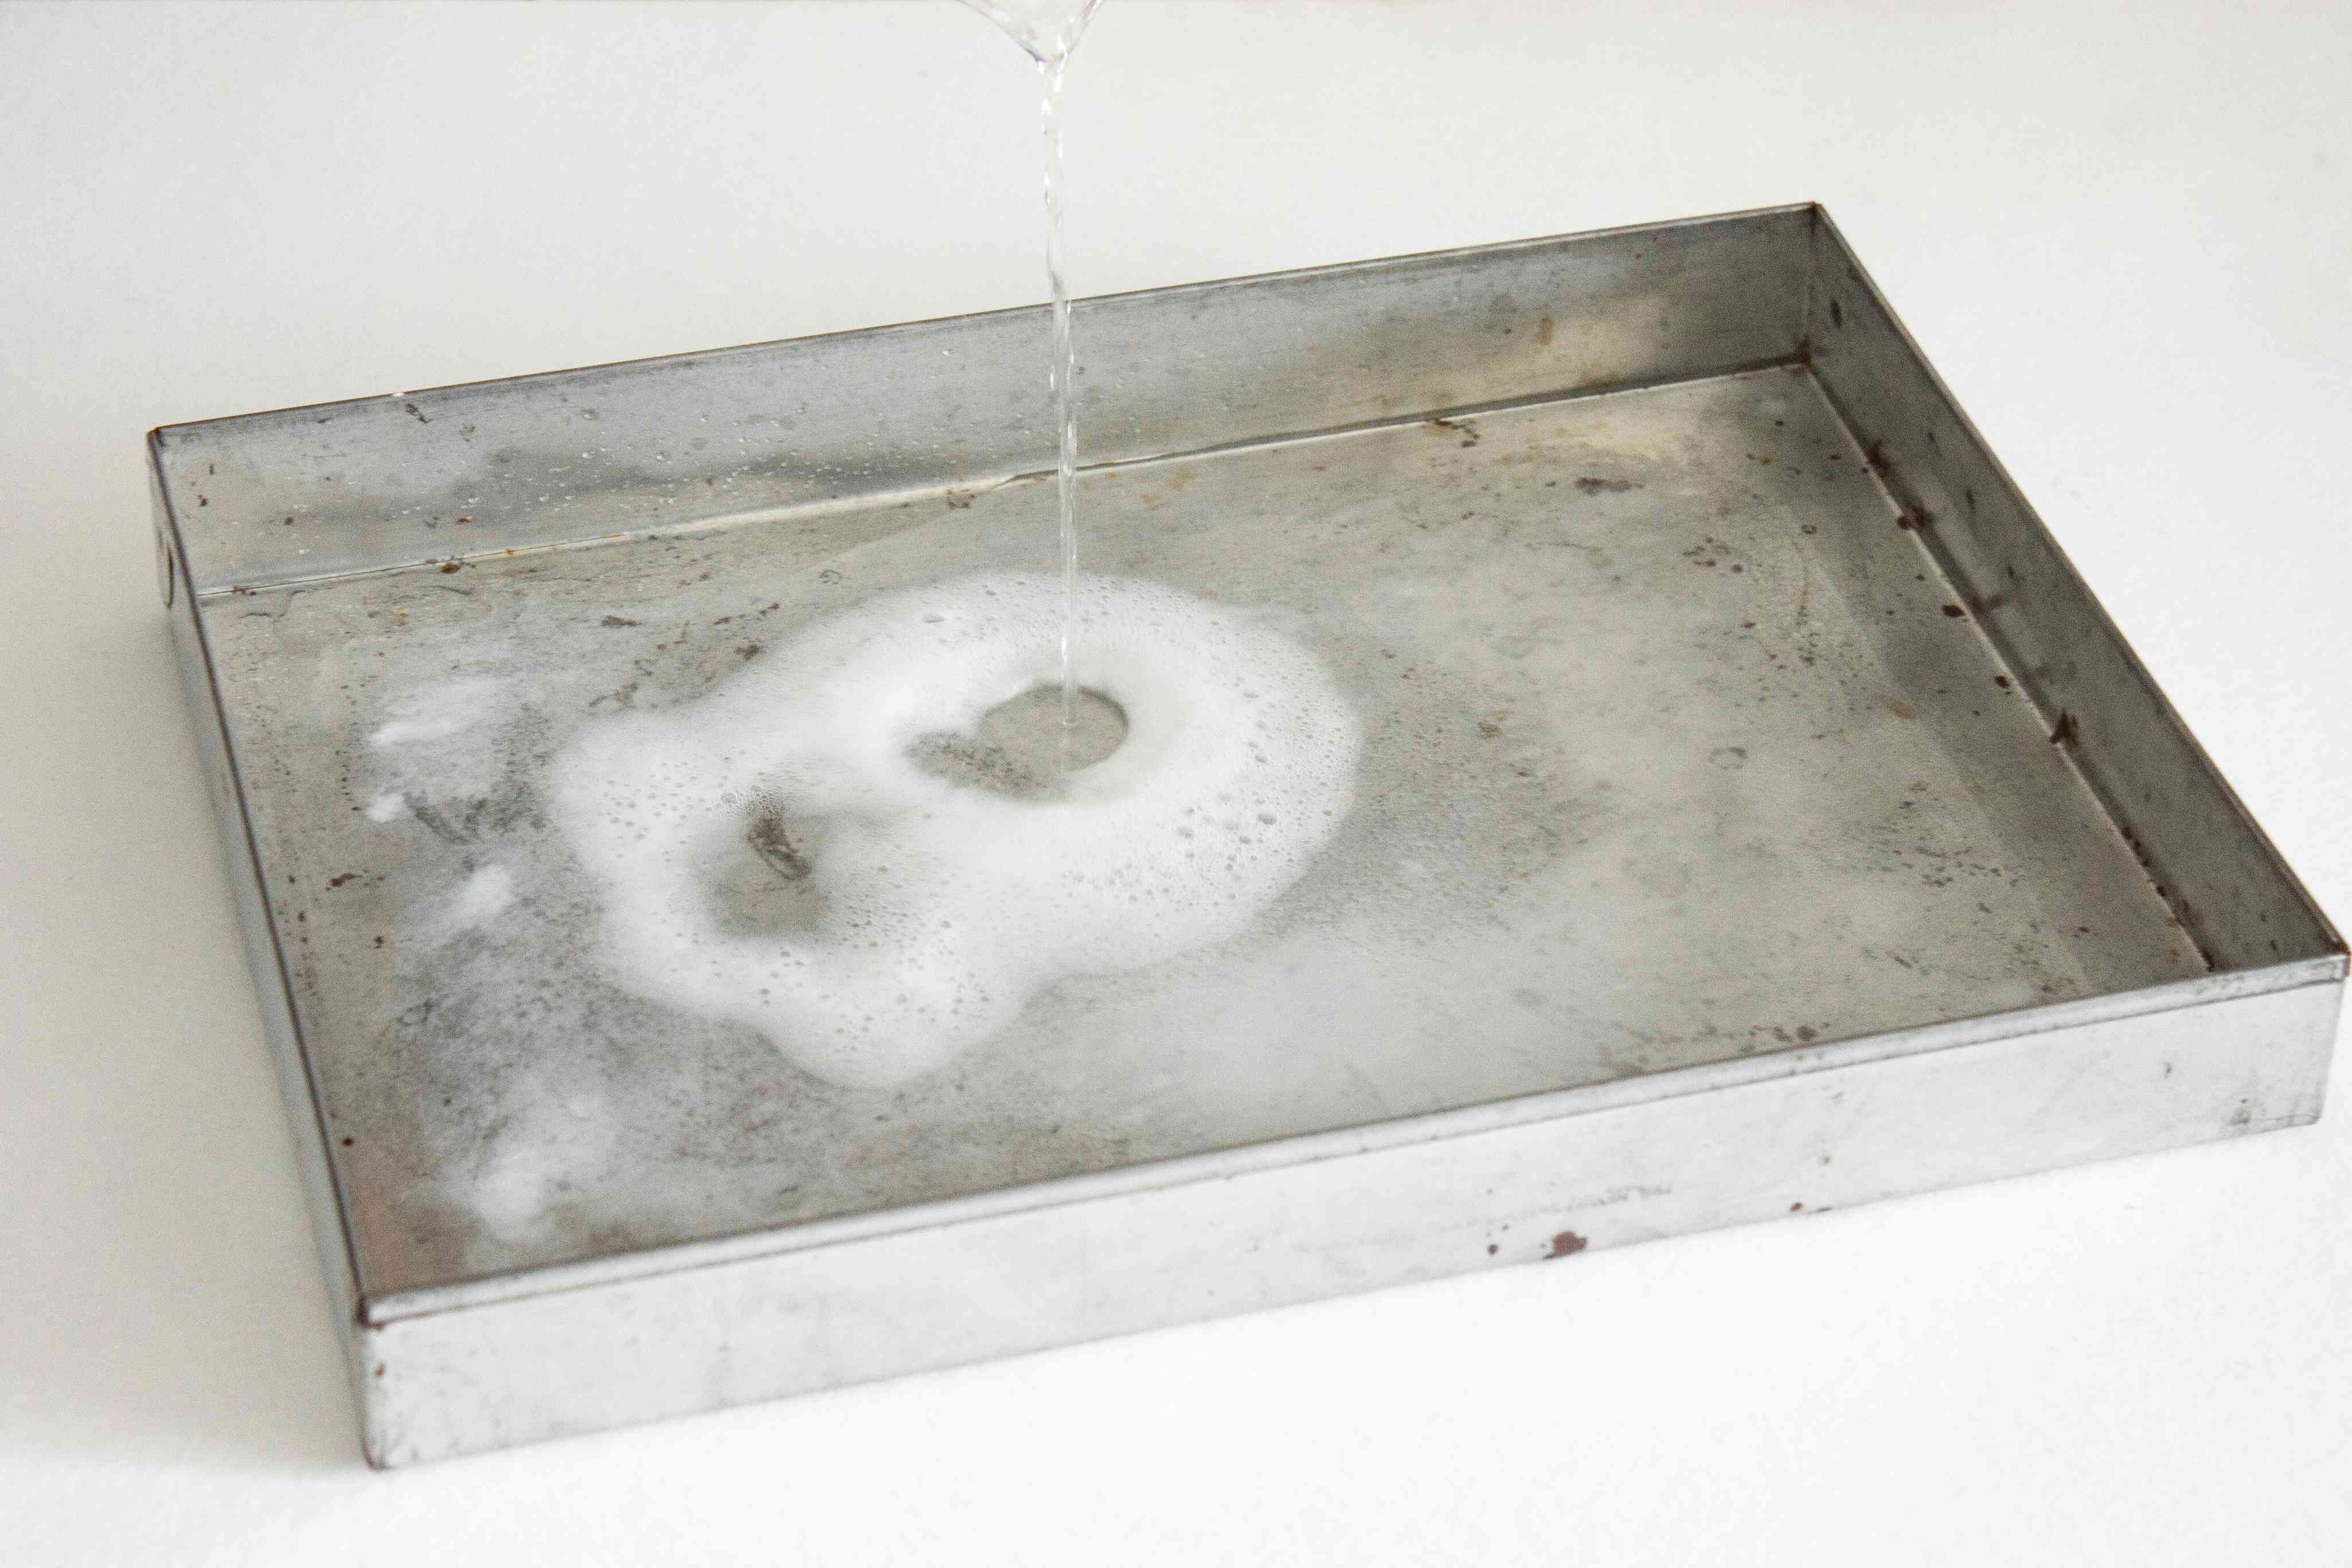 roasting pan fizzing